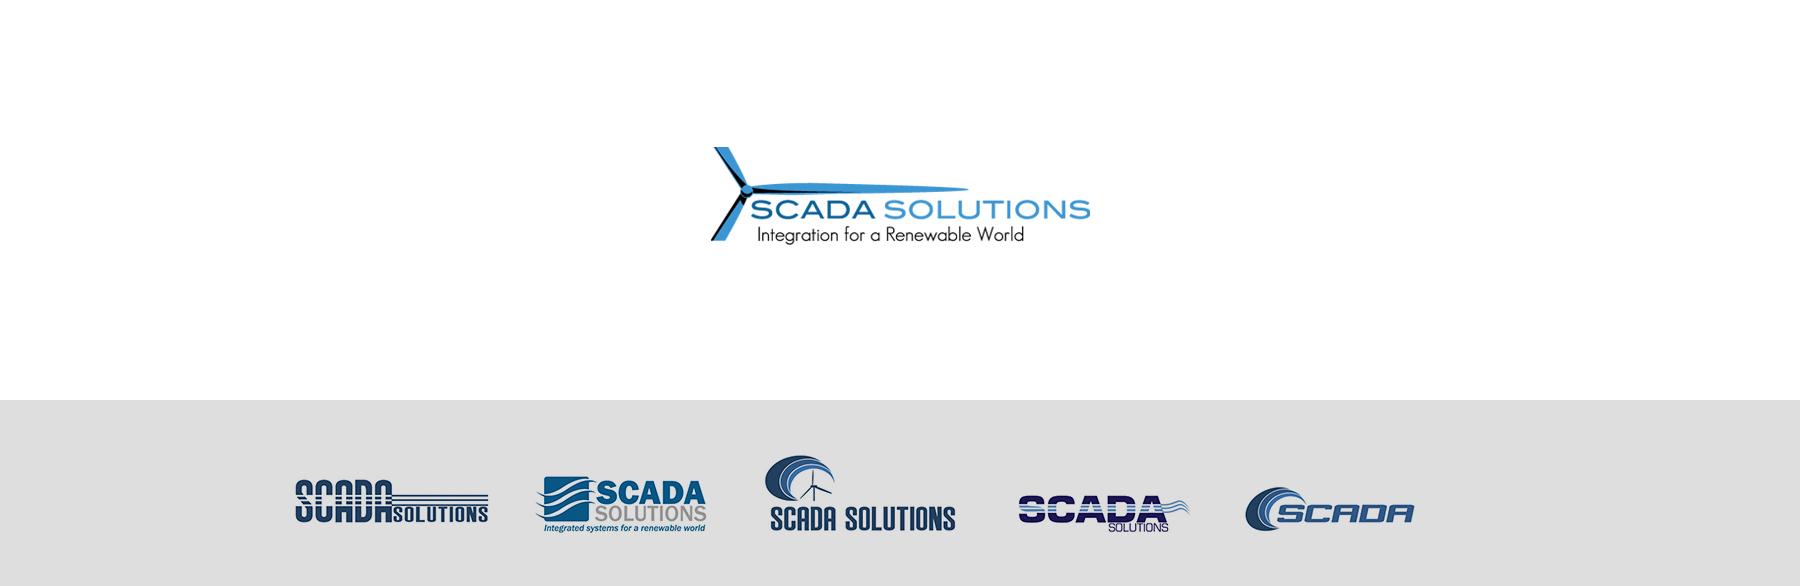 scada solutions.jpg